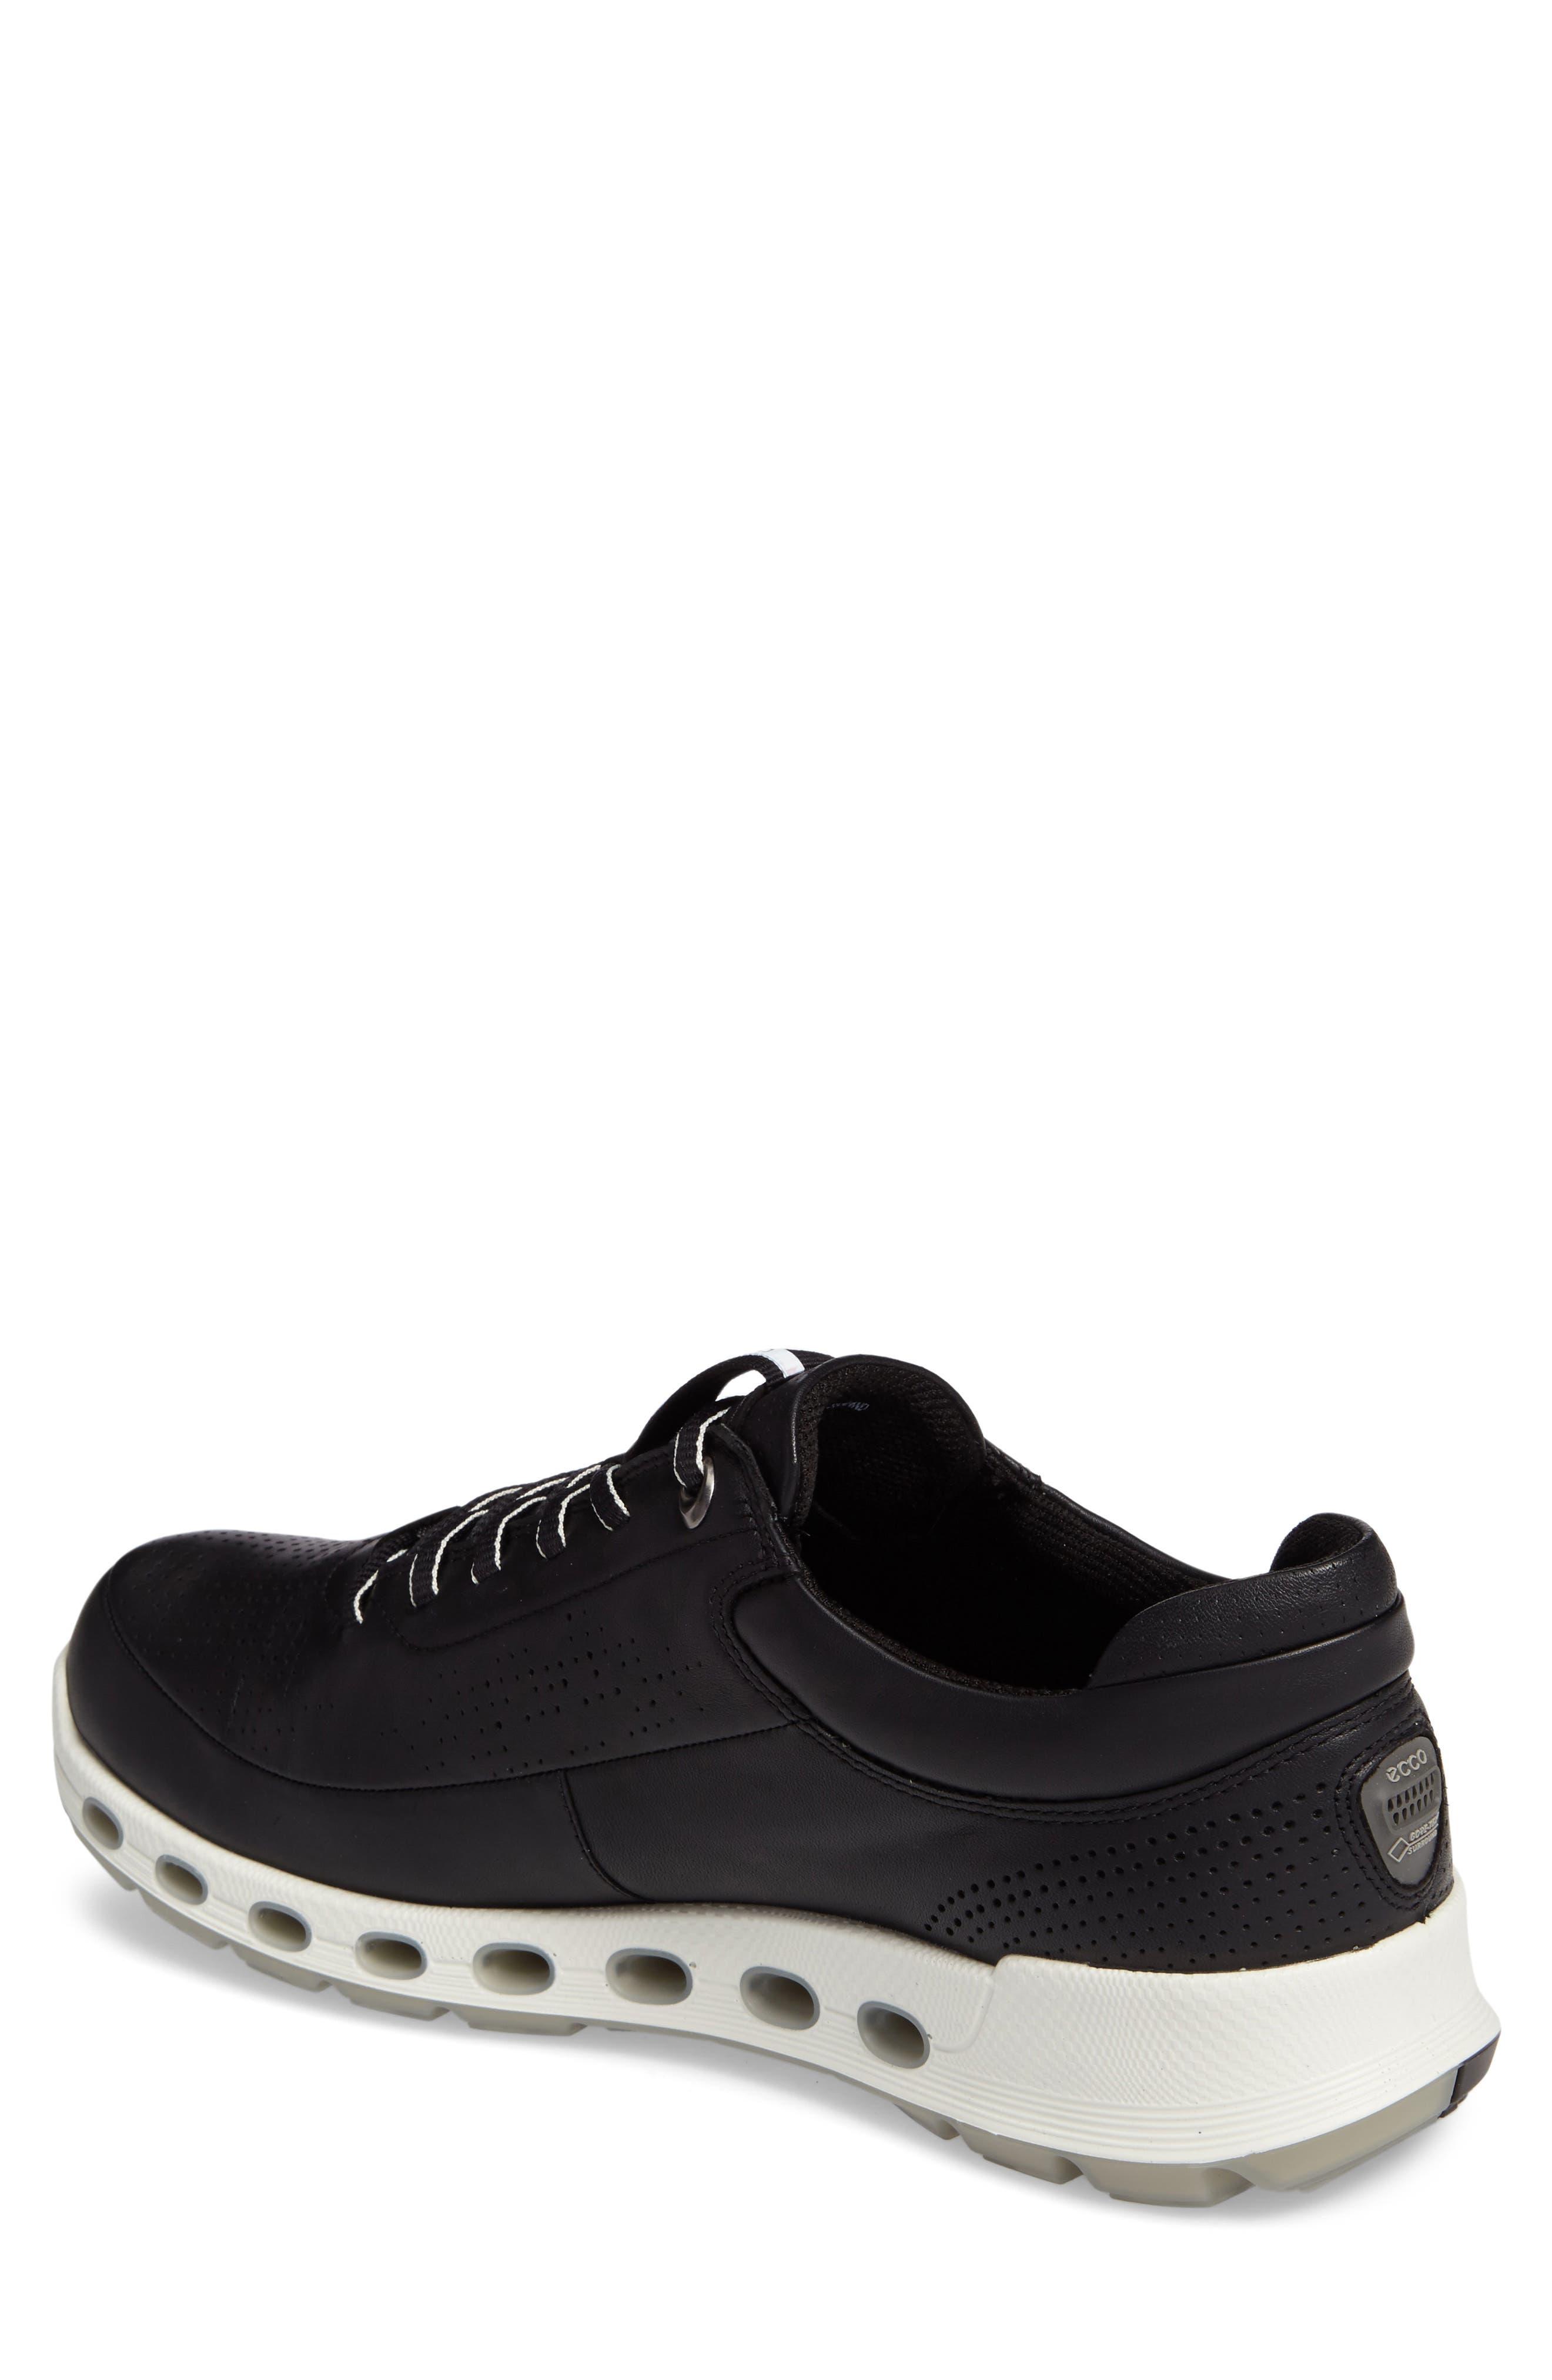 Cool 2.0 Leather GTX Sneaker,                             Alternate thumbnail 2, color,                             BLACK